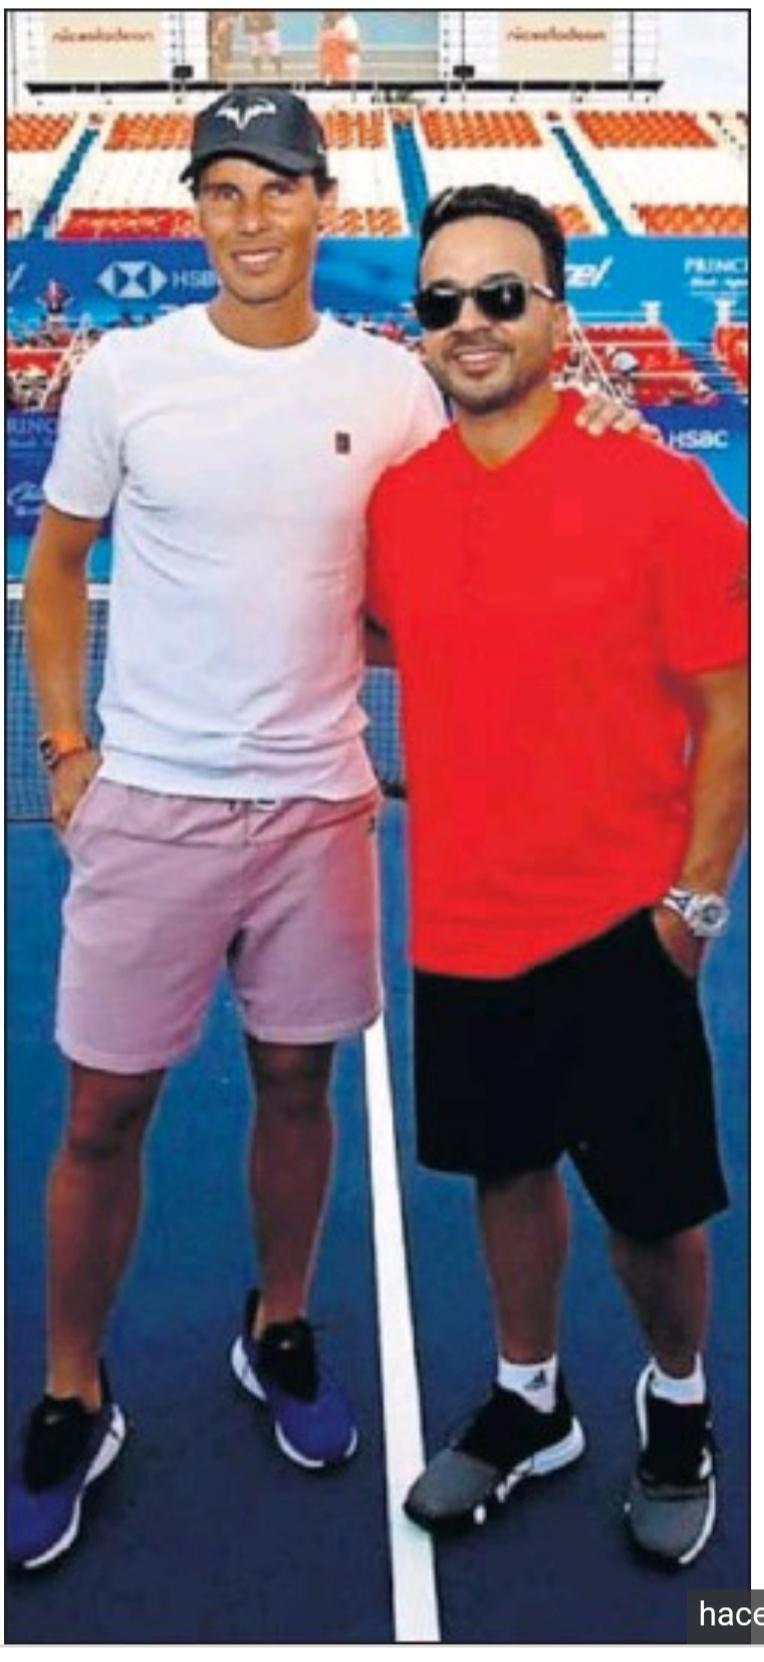 ¿Cuánto mide Luis Fonsi? - Estatura real: 1,71 - Real height - Página 3 Img_2011